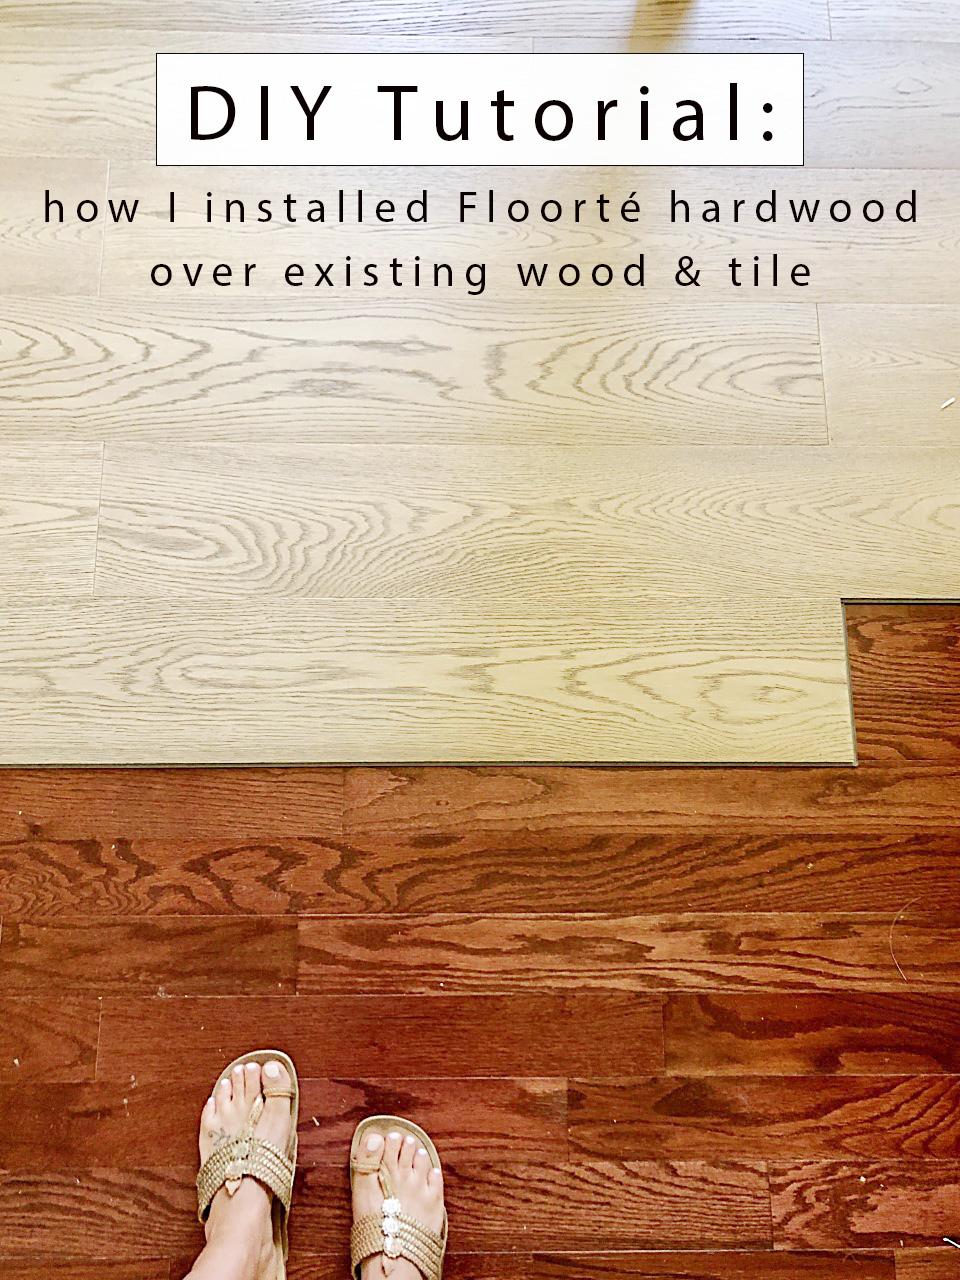 to install floating hardwood directly